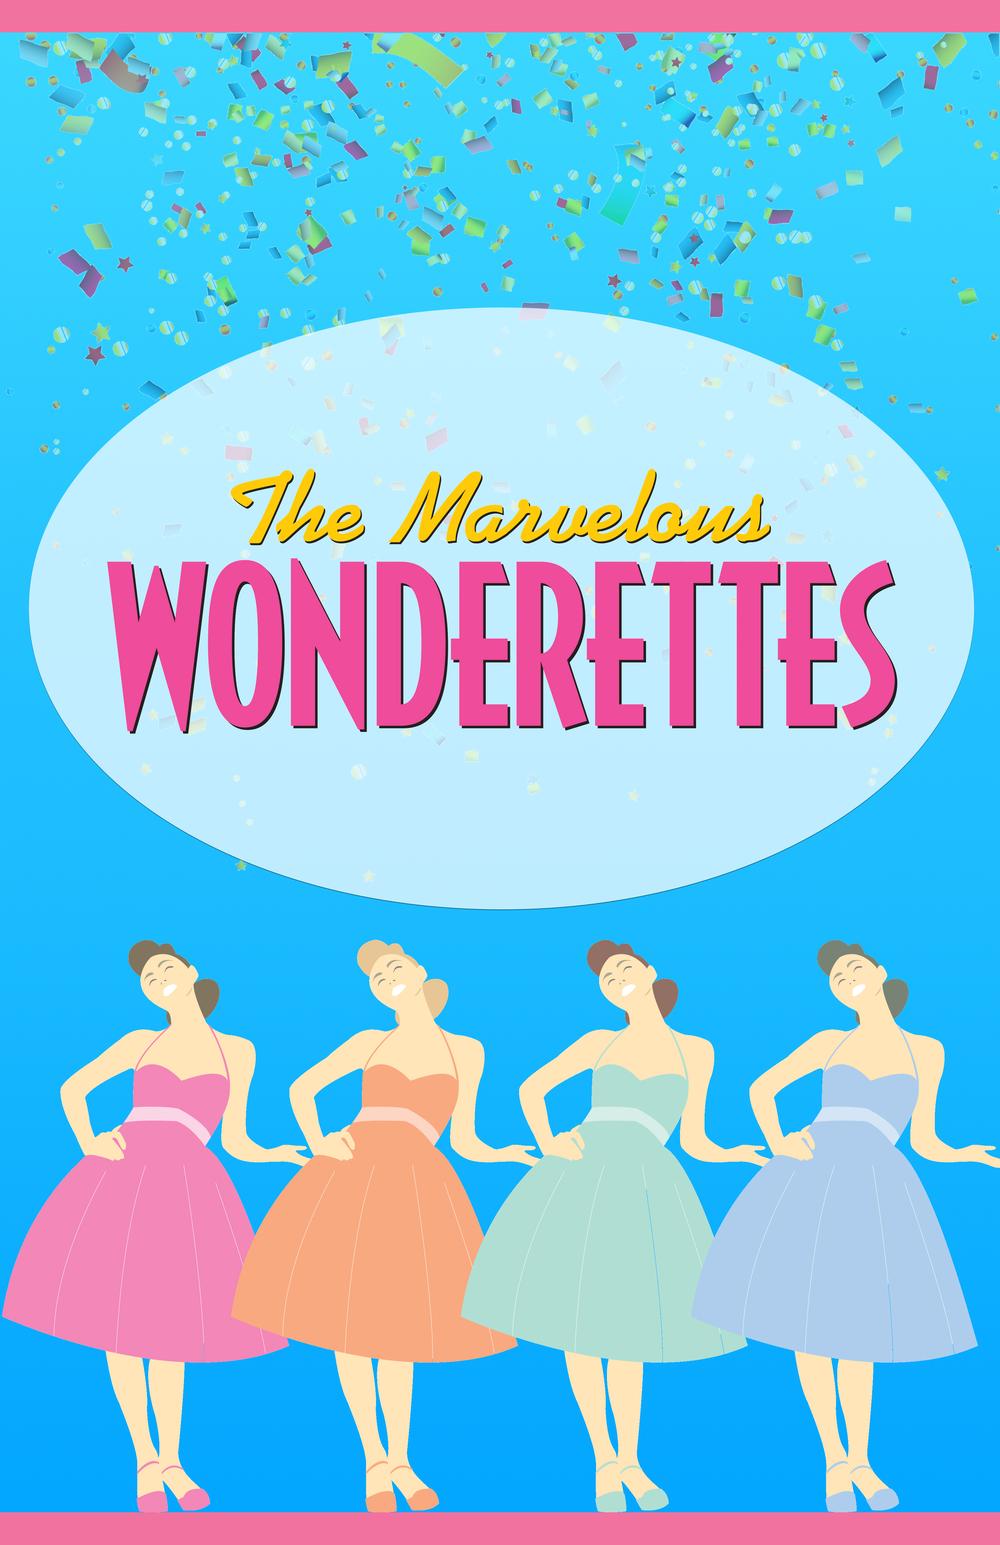 Wonderettes Poster.png